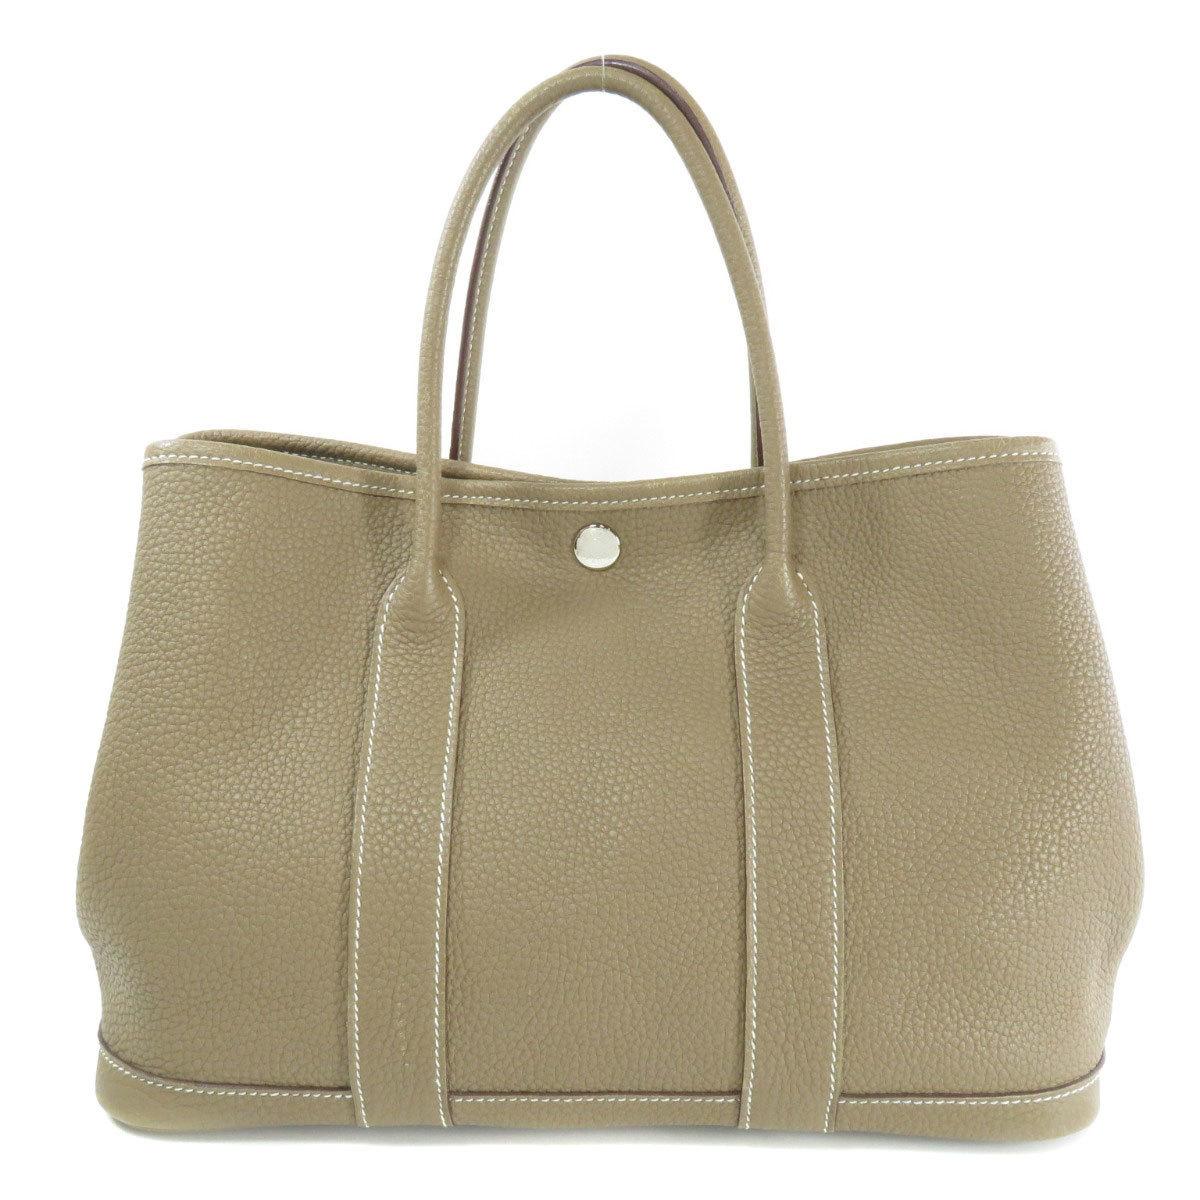 Hermes Garden Party TPM Negonda Etope Etup Tote Bag Ladies